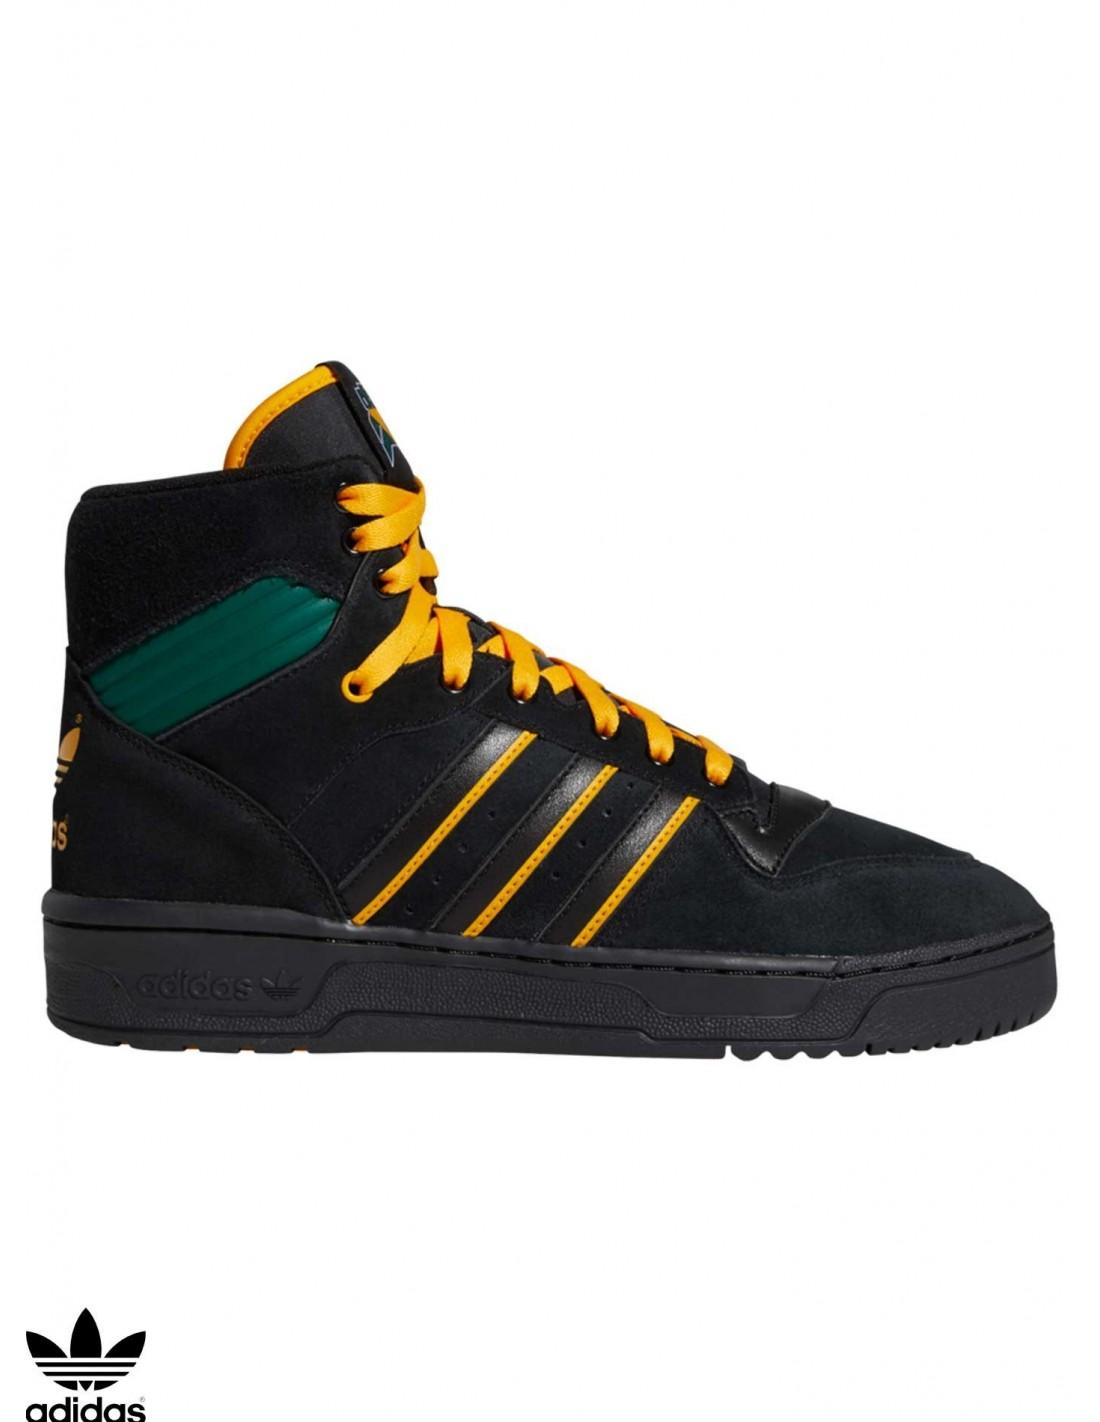 adidas skateboarding shoes high top